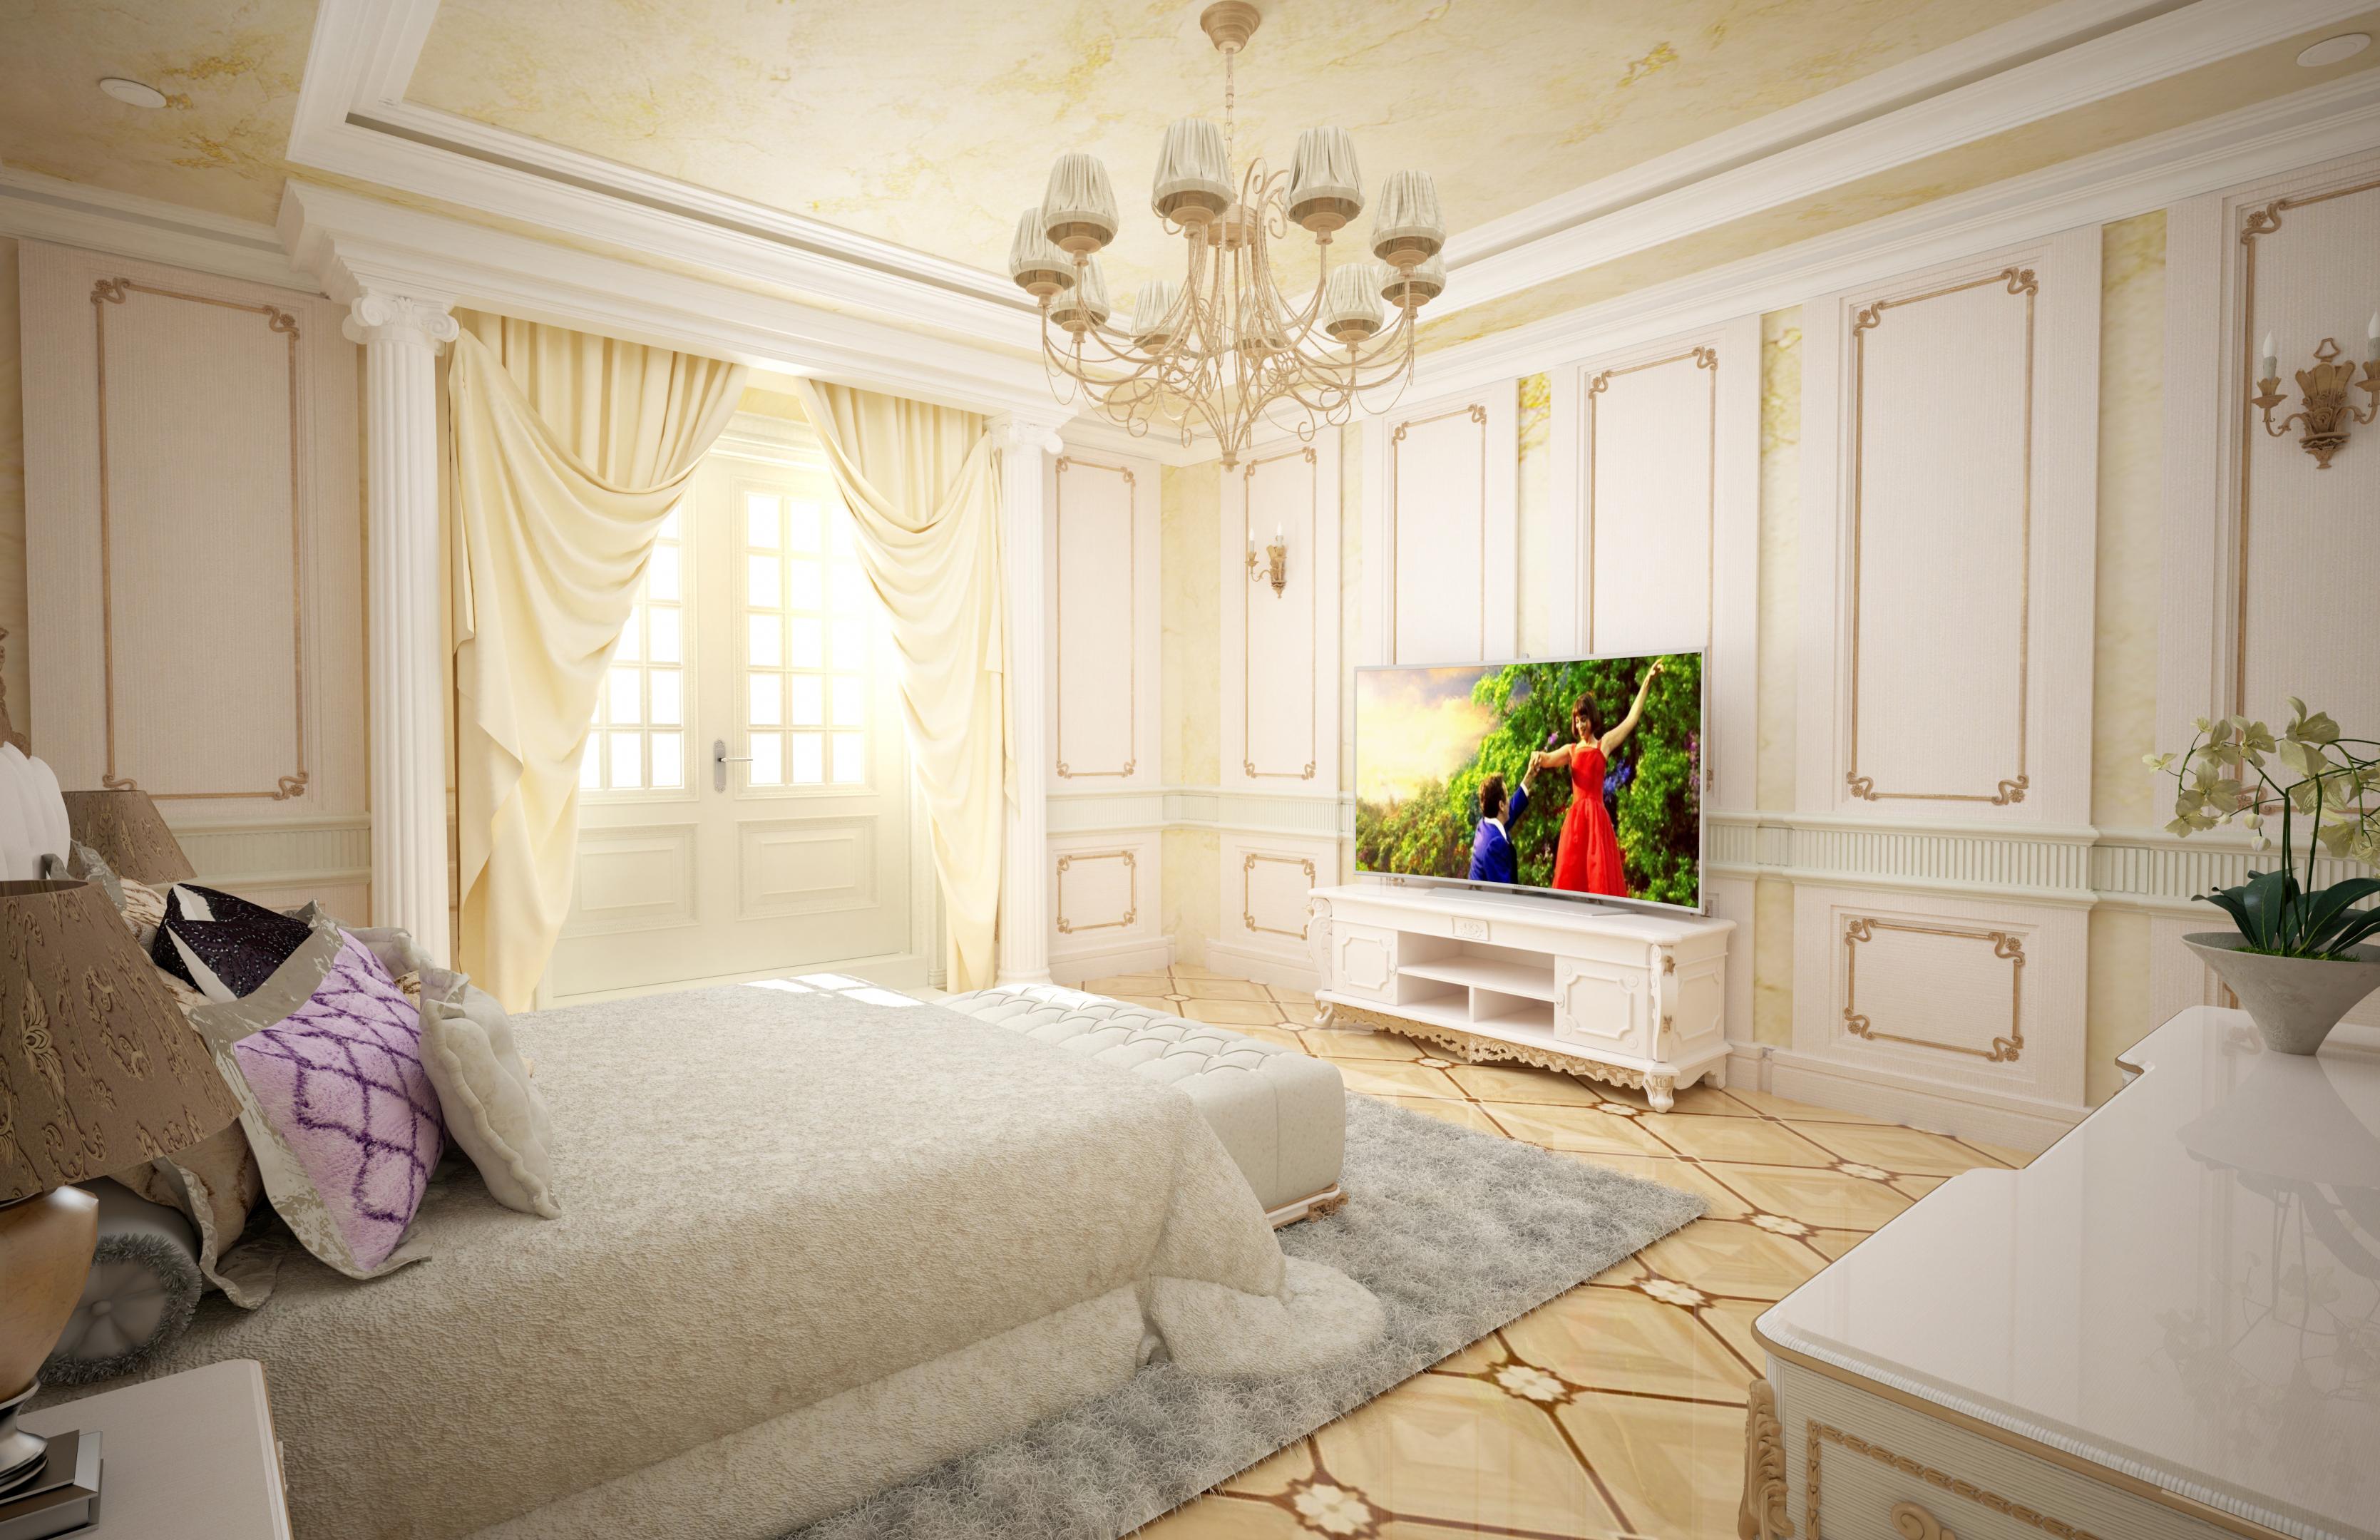 Bedroom in Maya vray 3.0 image